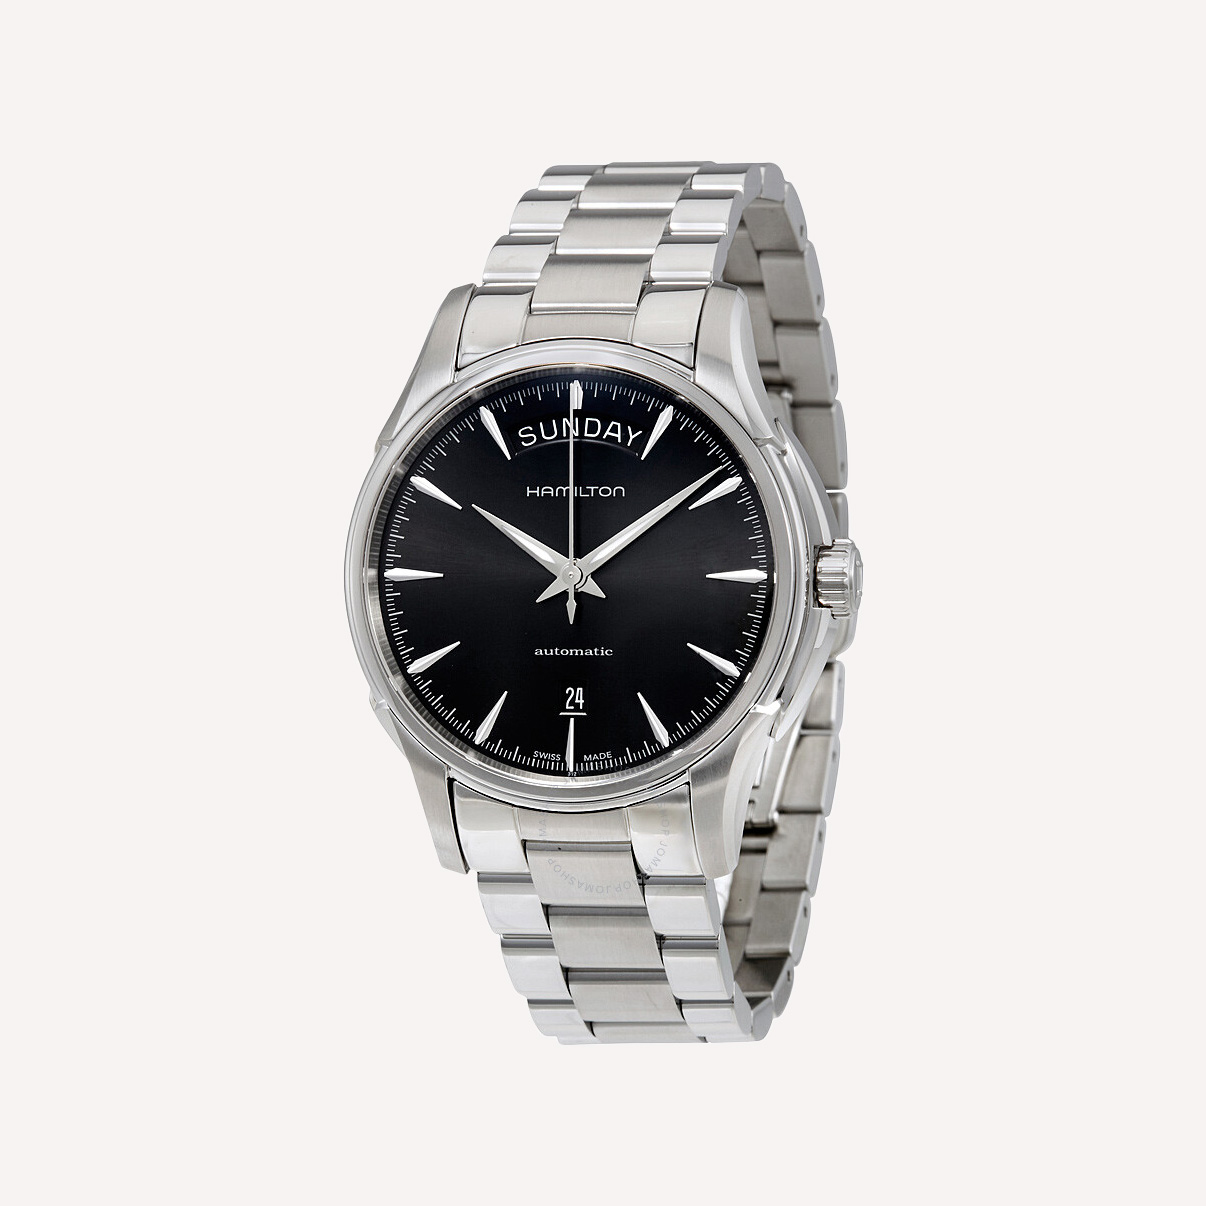 hamilton jazzmaster black dial stainless steel men_s watch h32505131